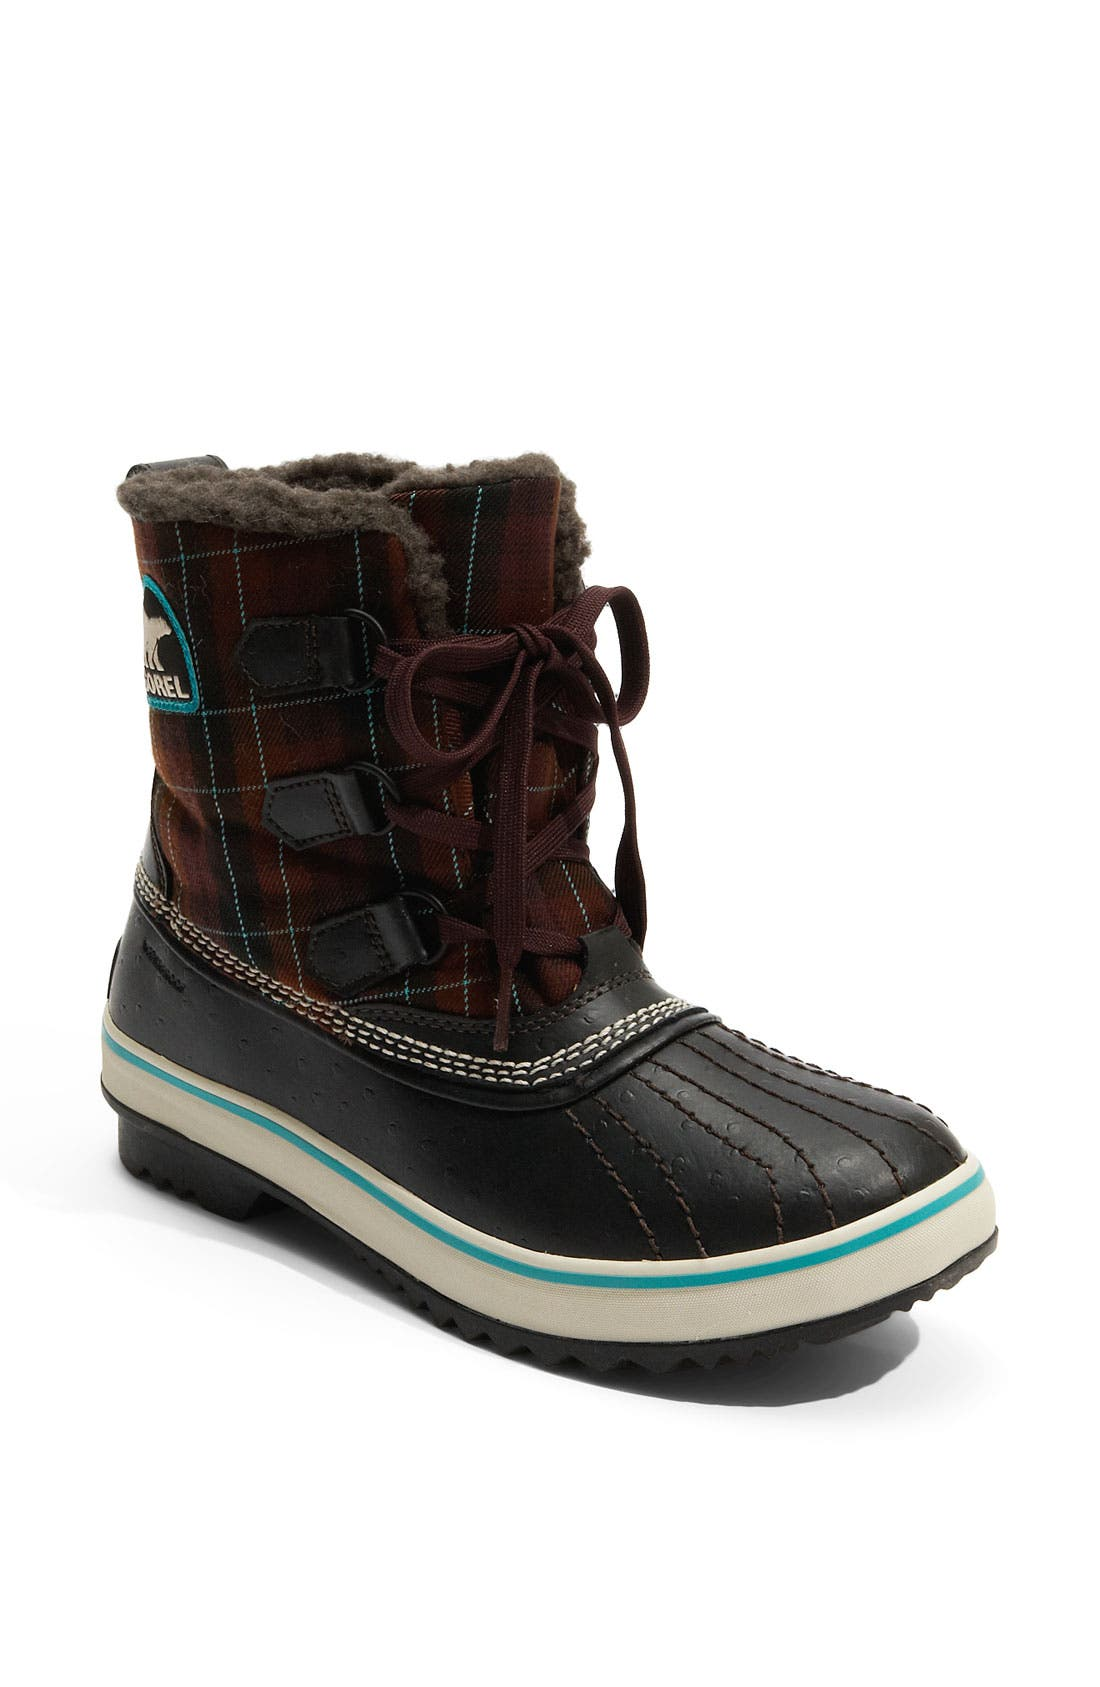 Alternate Image 1 Selected - SOREL 'Tivoli' Waterproof Boot